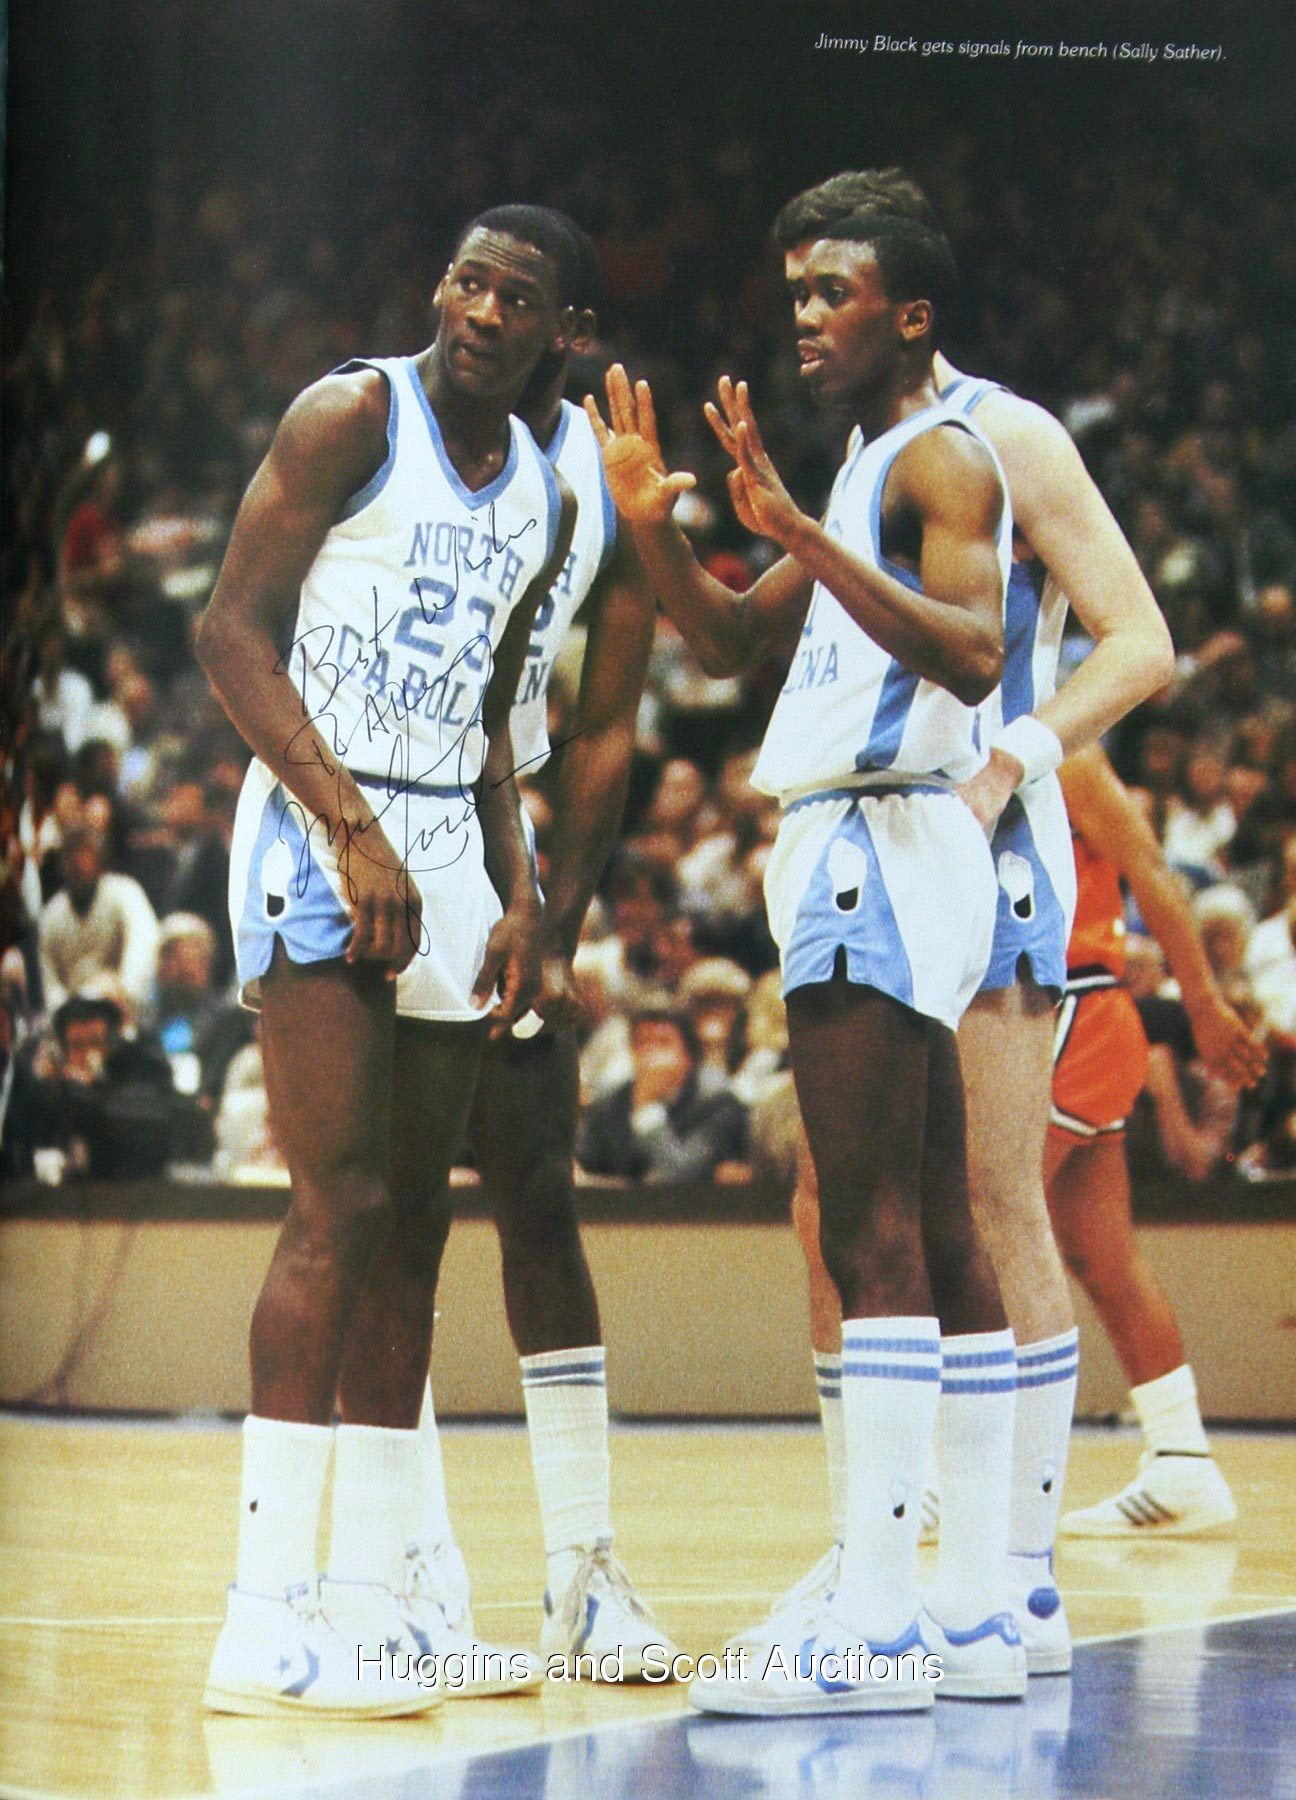 big sale b33d9 6da43 Michael Jordan & Jimmy Black | Carolina Blue | College hoops ...